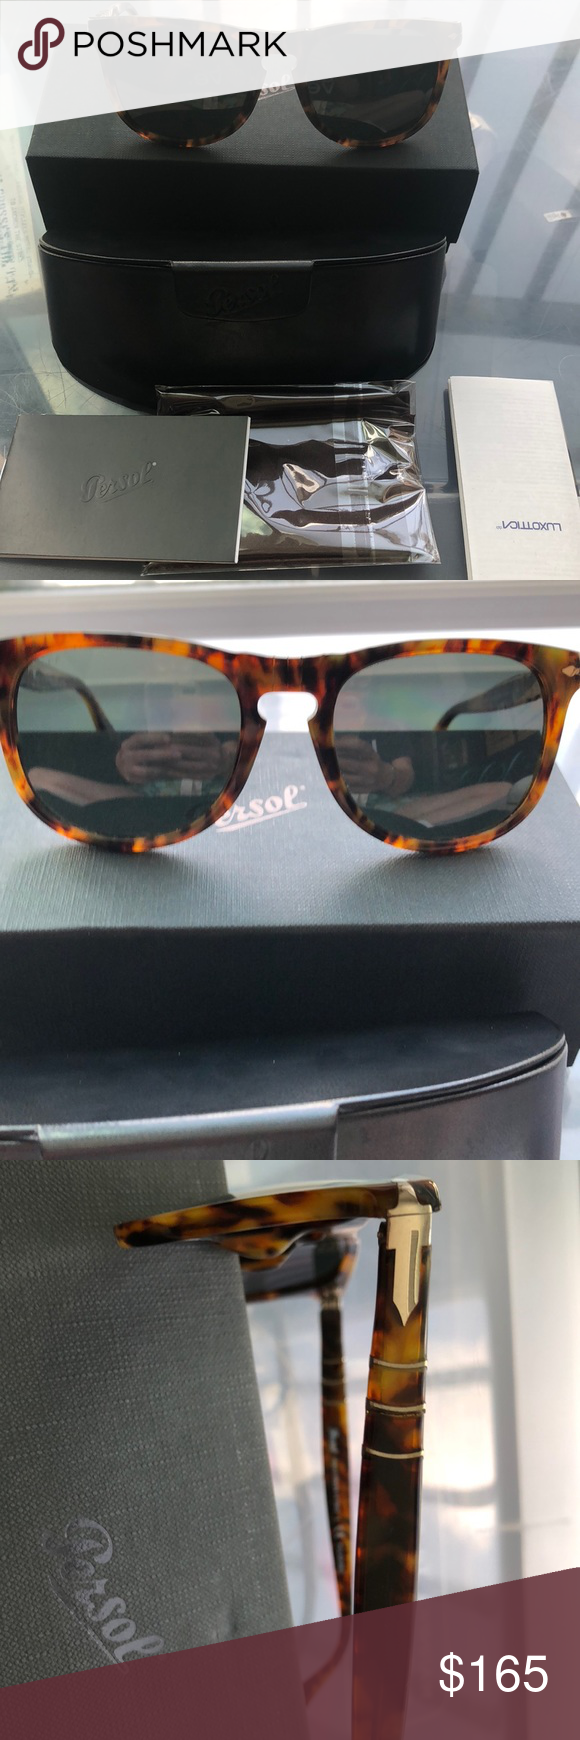 0e01e19952c8a Persol Polarized Sunglasses Handmade in Italy polarized Persol Sunglasses-  brand new